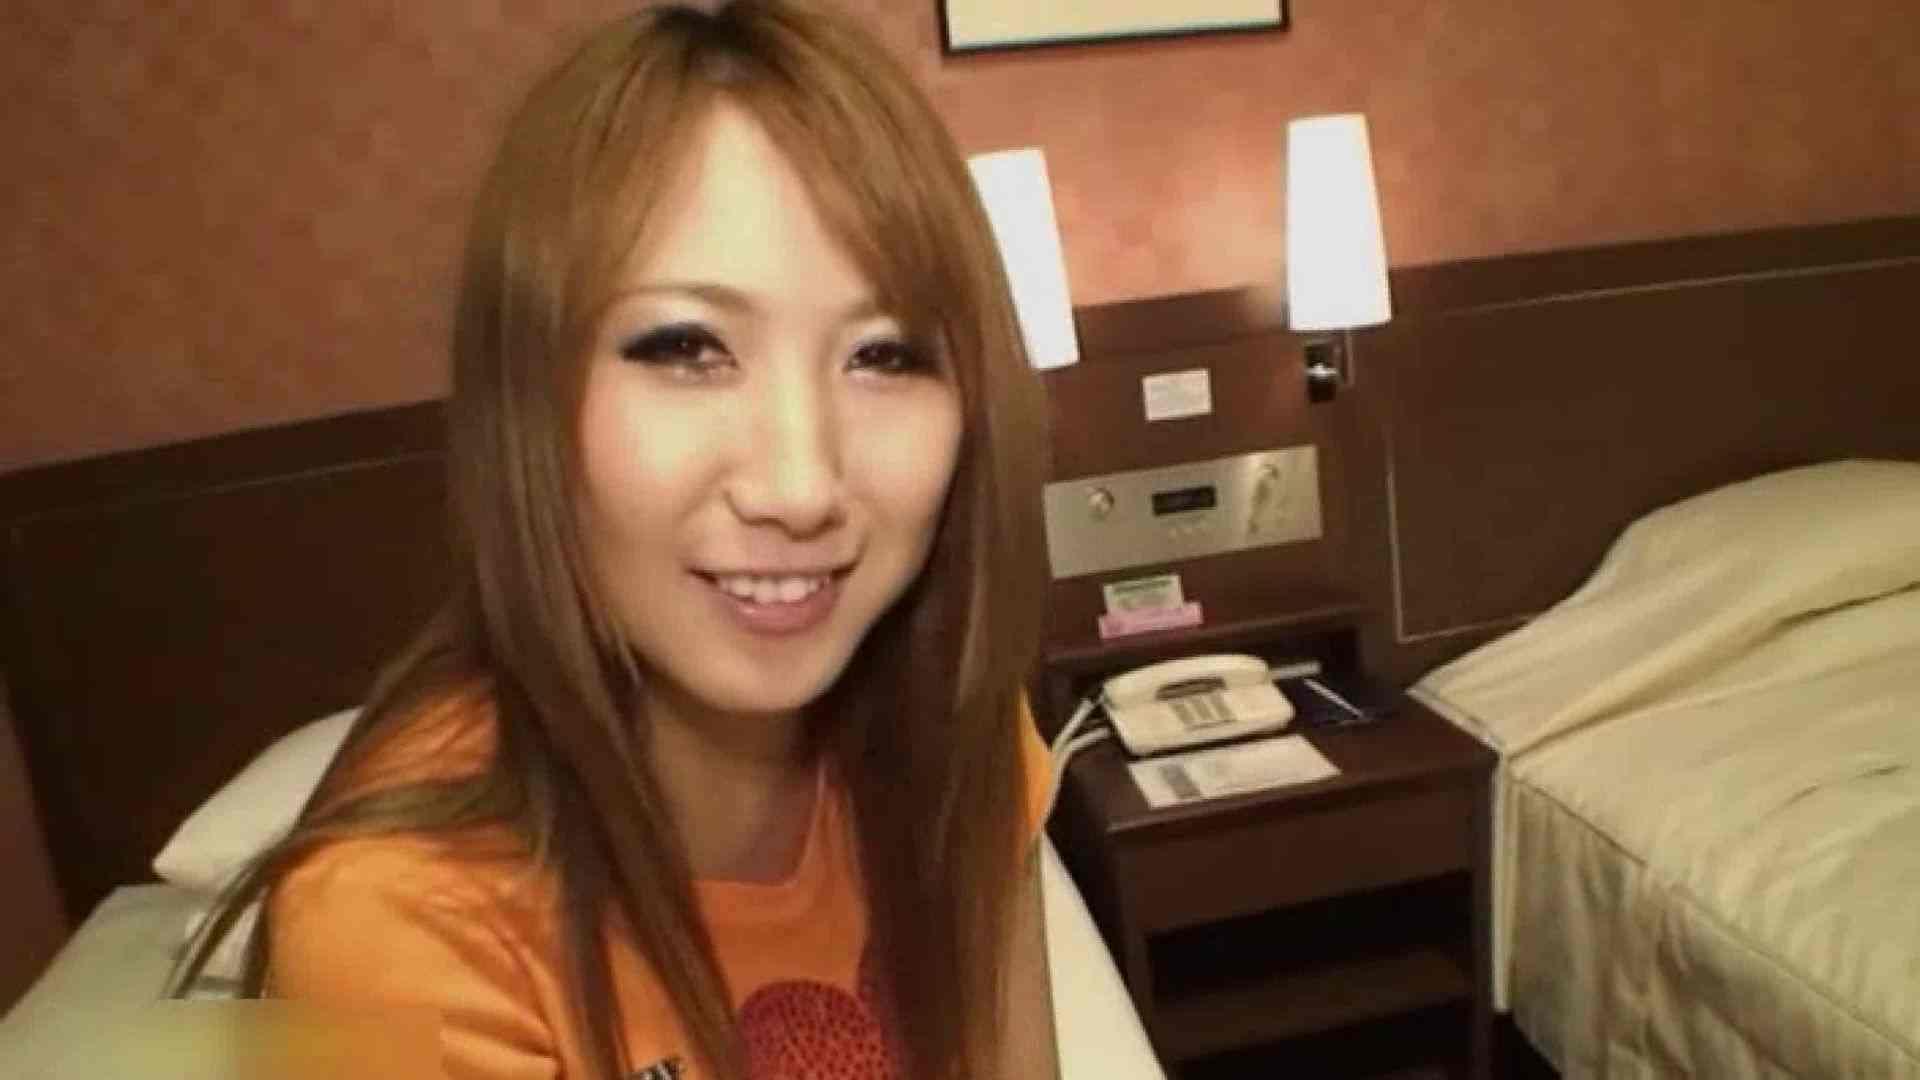 S級厳選美女ビッチガールVol.02 0   0  59画像 2